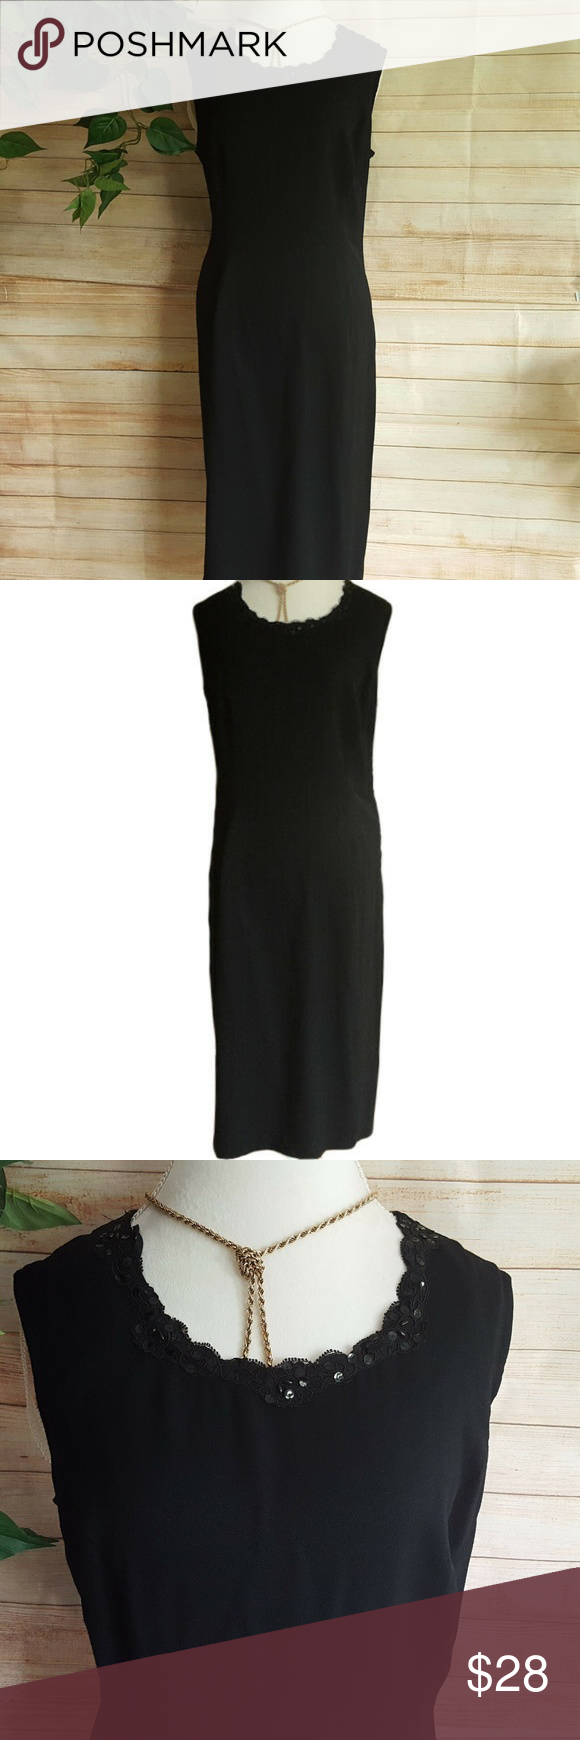 Vintage R M Richards Karen Kwong Black Dress Lbd Black Dress Size 16 Dresses Clothes Design [ 1740 x 580 Pixel ]